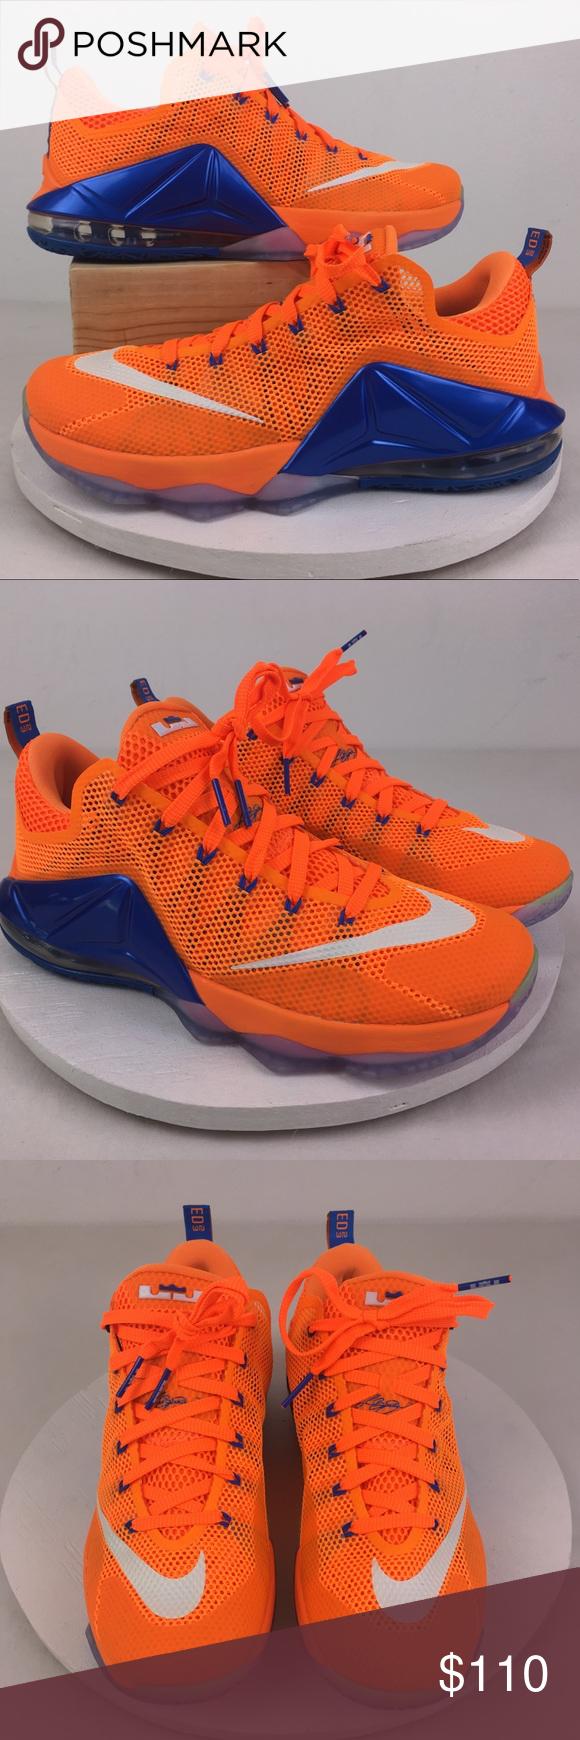 55a3ffa94d16 Nike LeBron 12 Low Orange Blue 10.5 724557-838 Brand new without original  box